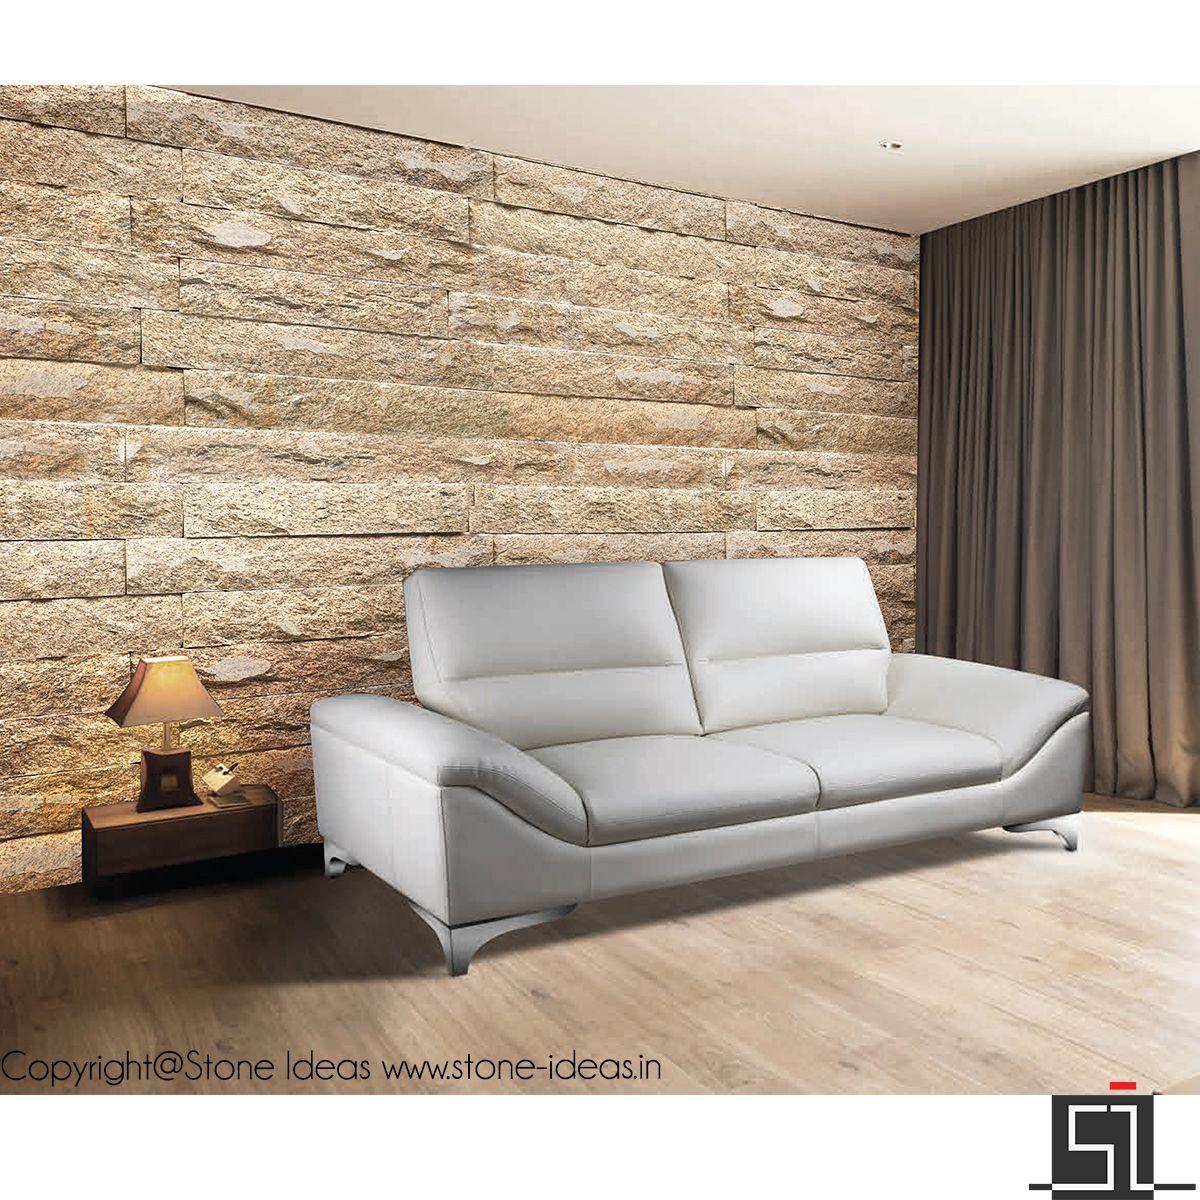 Living Room Wall Cladding Ideas Livingroom Livingroomwalltiles Stonetilesforlivingroom Stonetiles S Living Room Tiles Wall Cladding Stone Wall Cladding